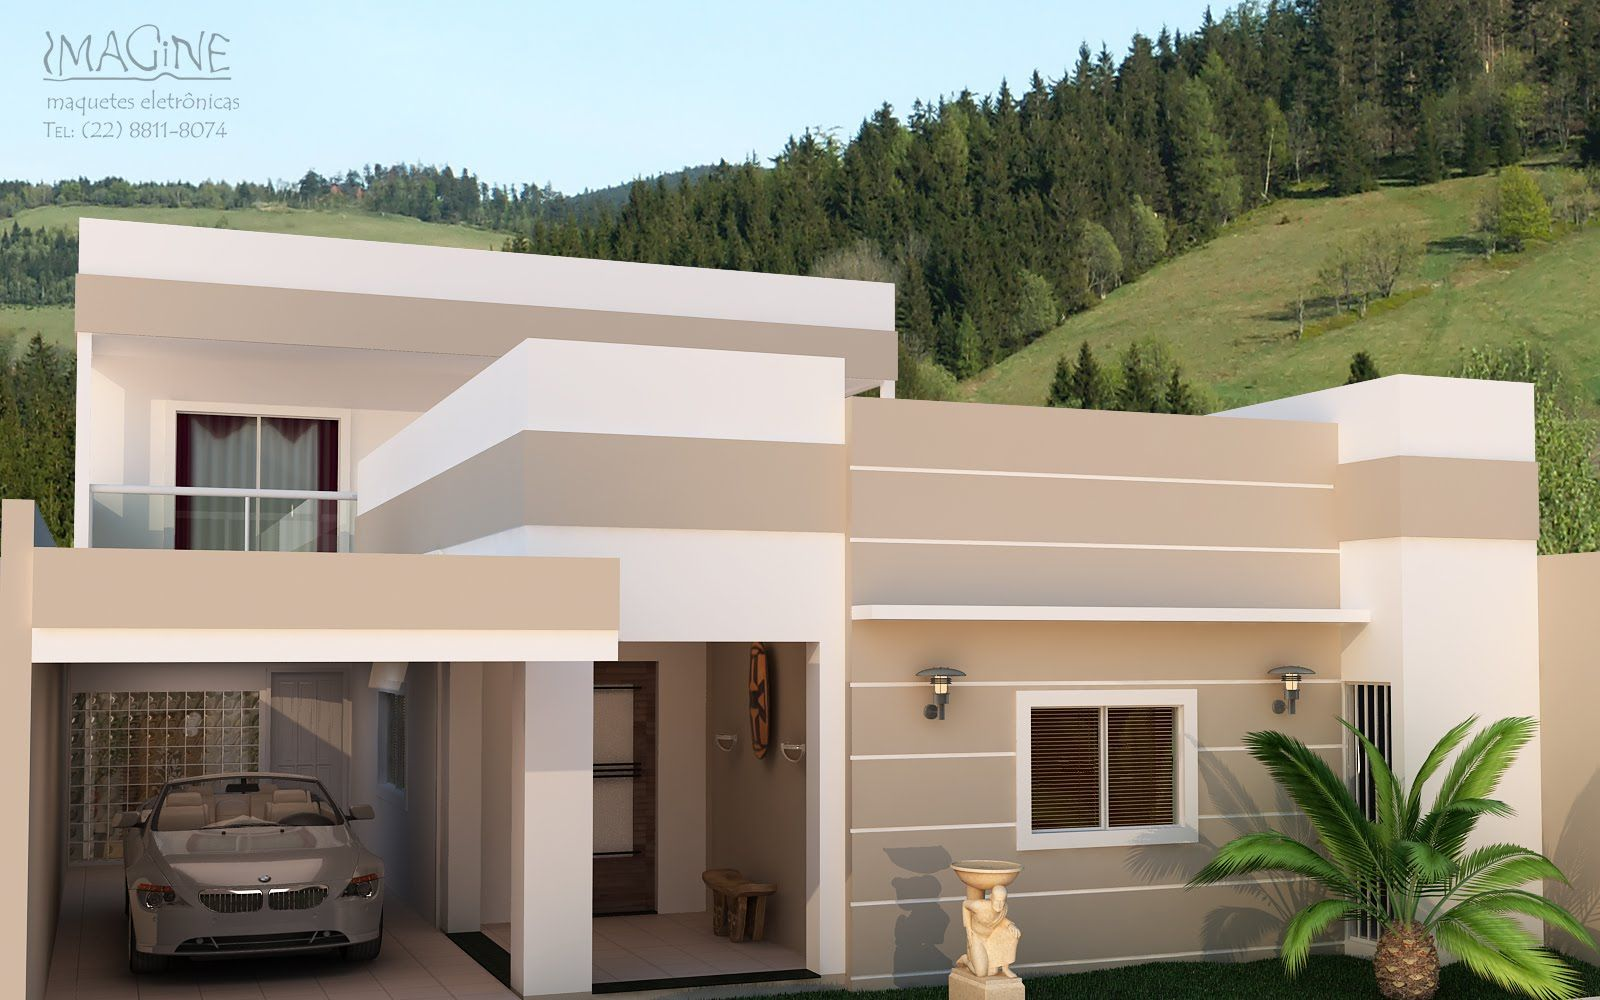 Fachadas de casas com cores fortes pesquisa google for Fachadas de casas modernas